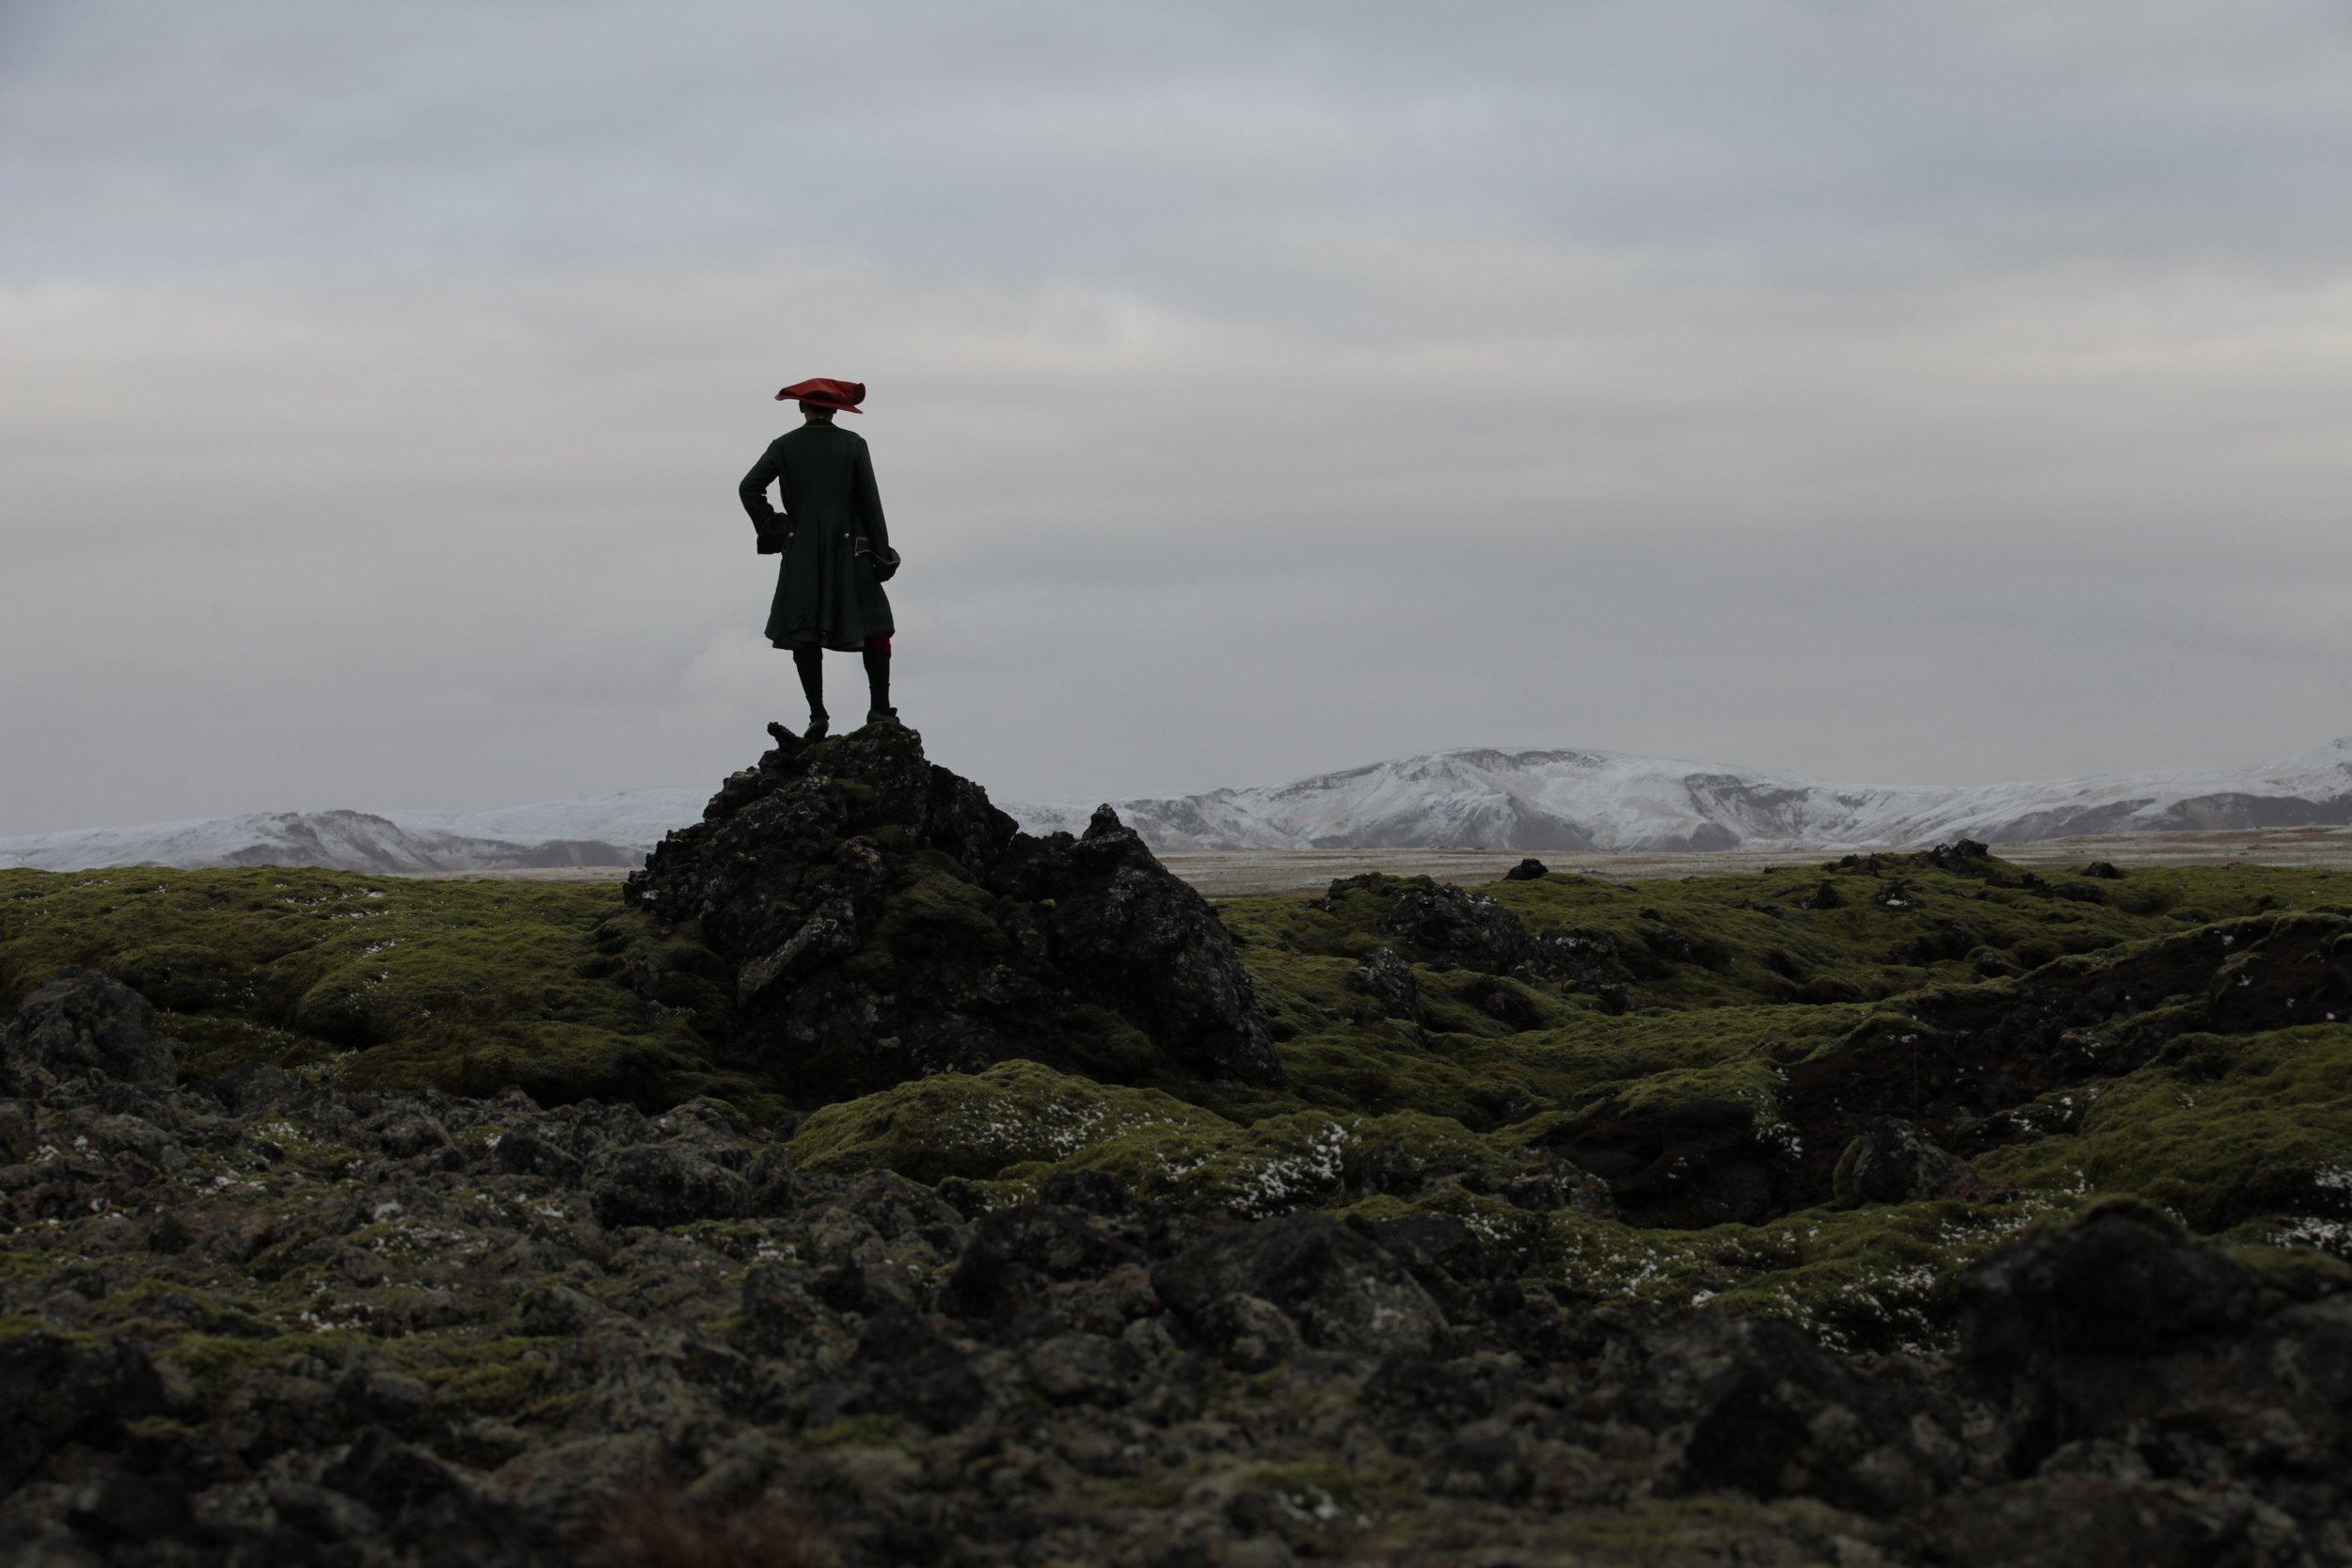 01 HnM - Performance Kilián Ignác D. Iceland 2016.jpg